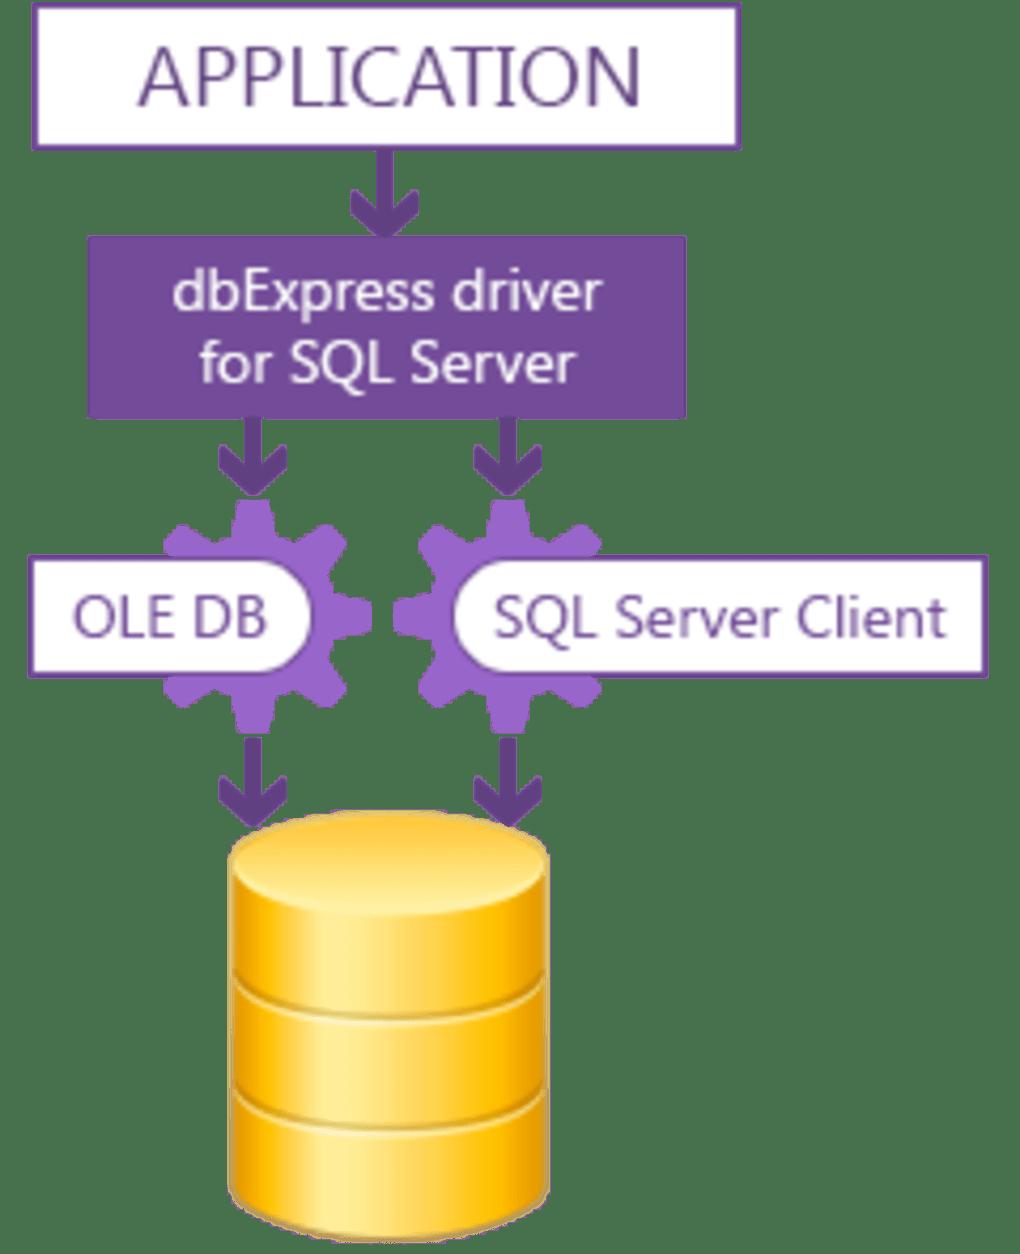 dbExpress driver for SQL Server Standard